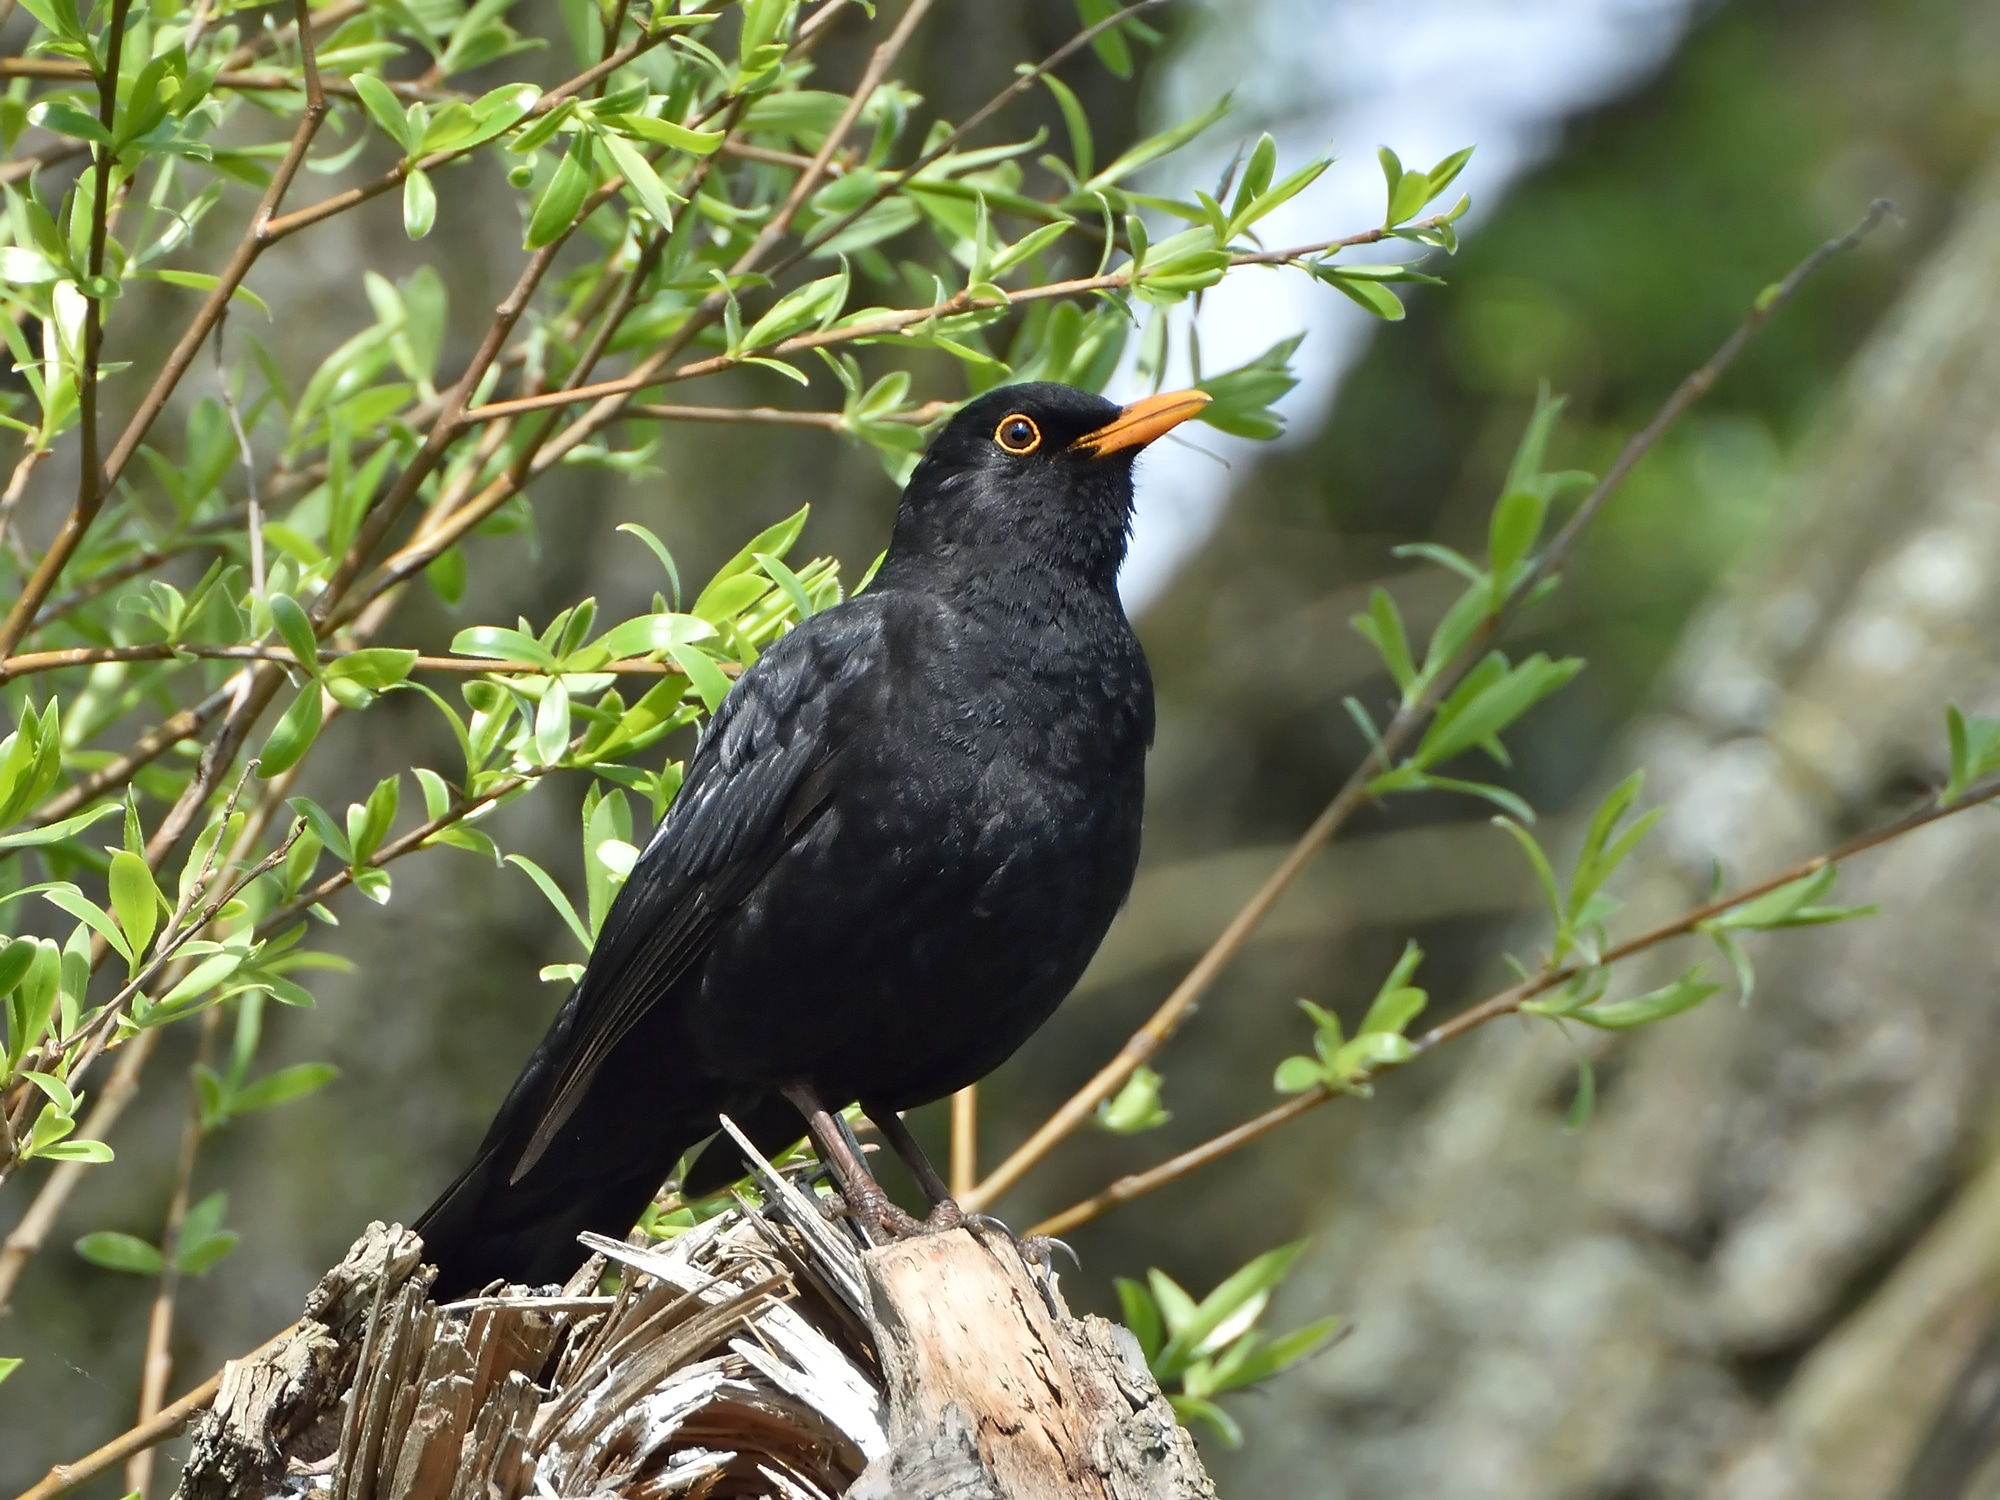 Blackbird resting on a branch in its habitat